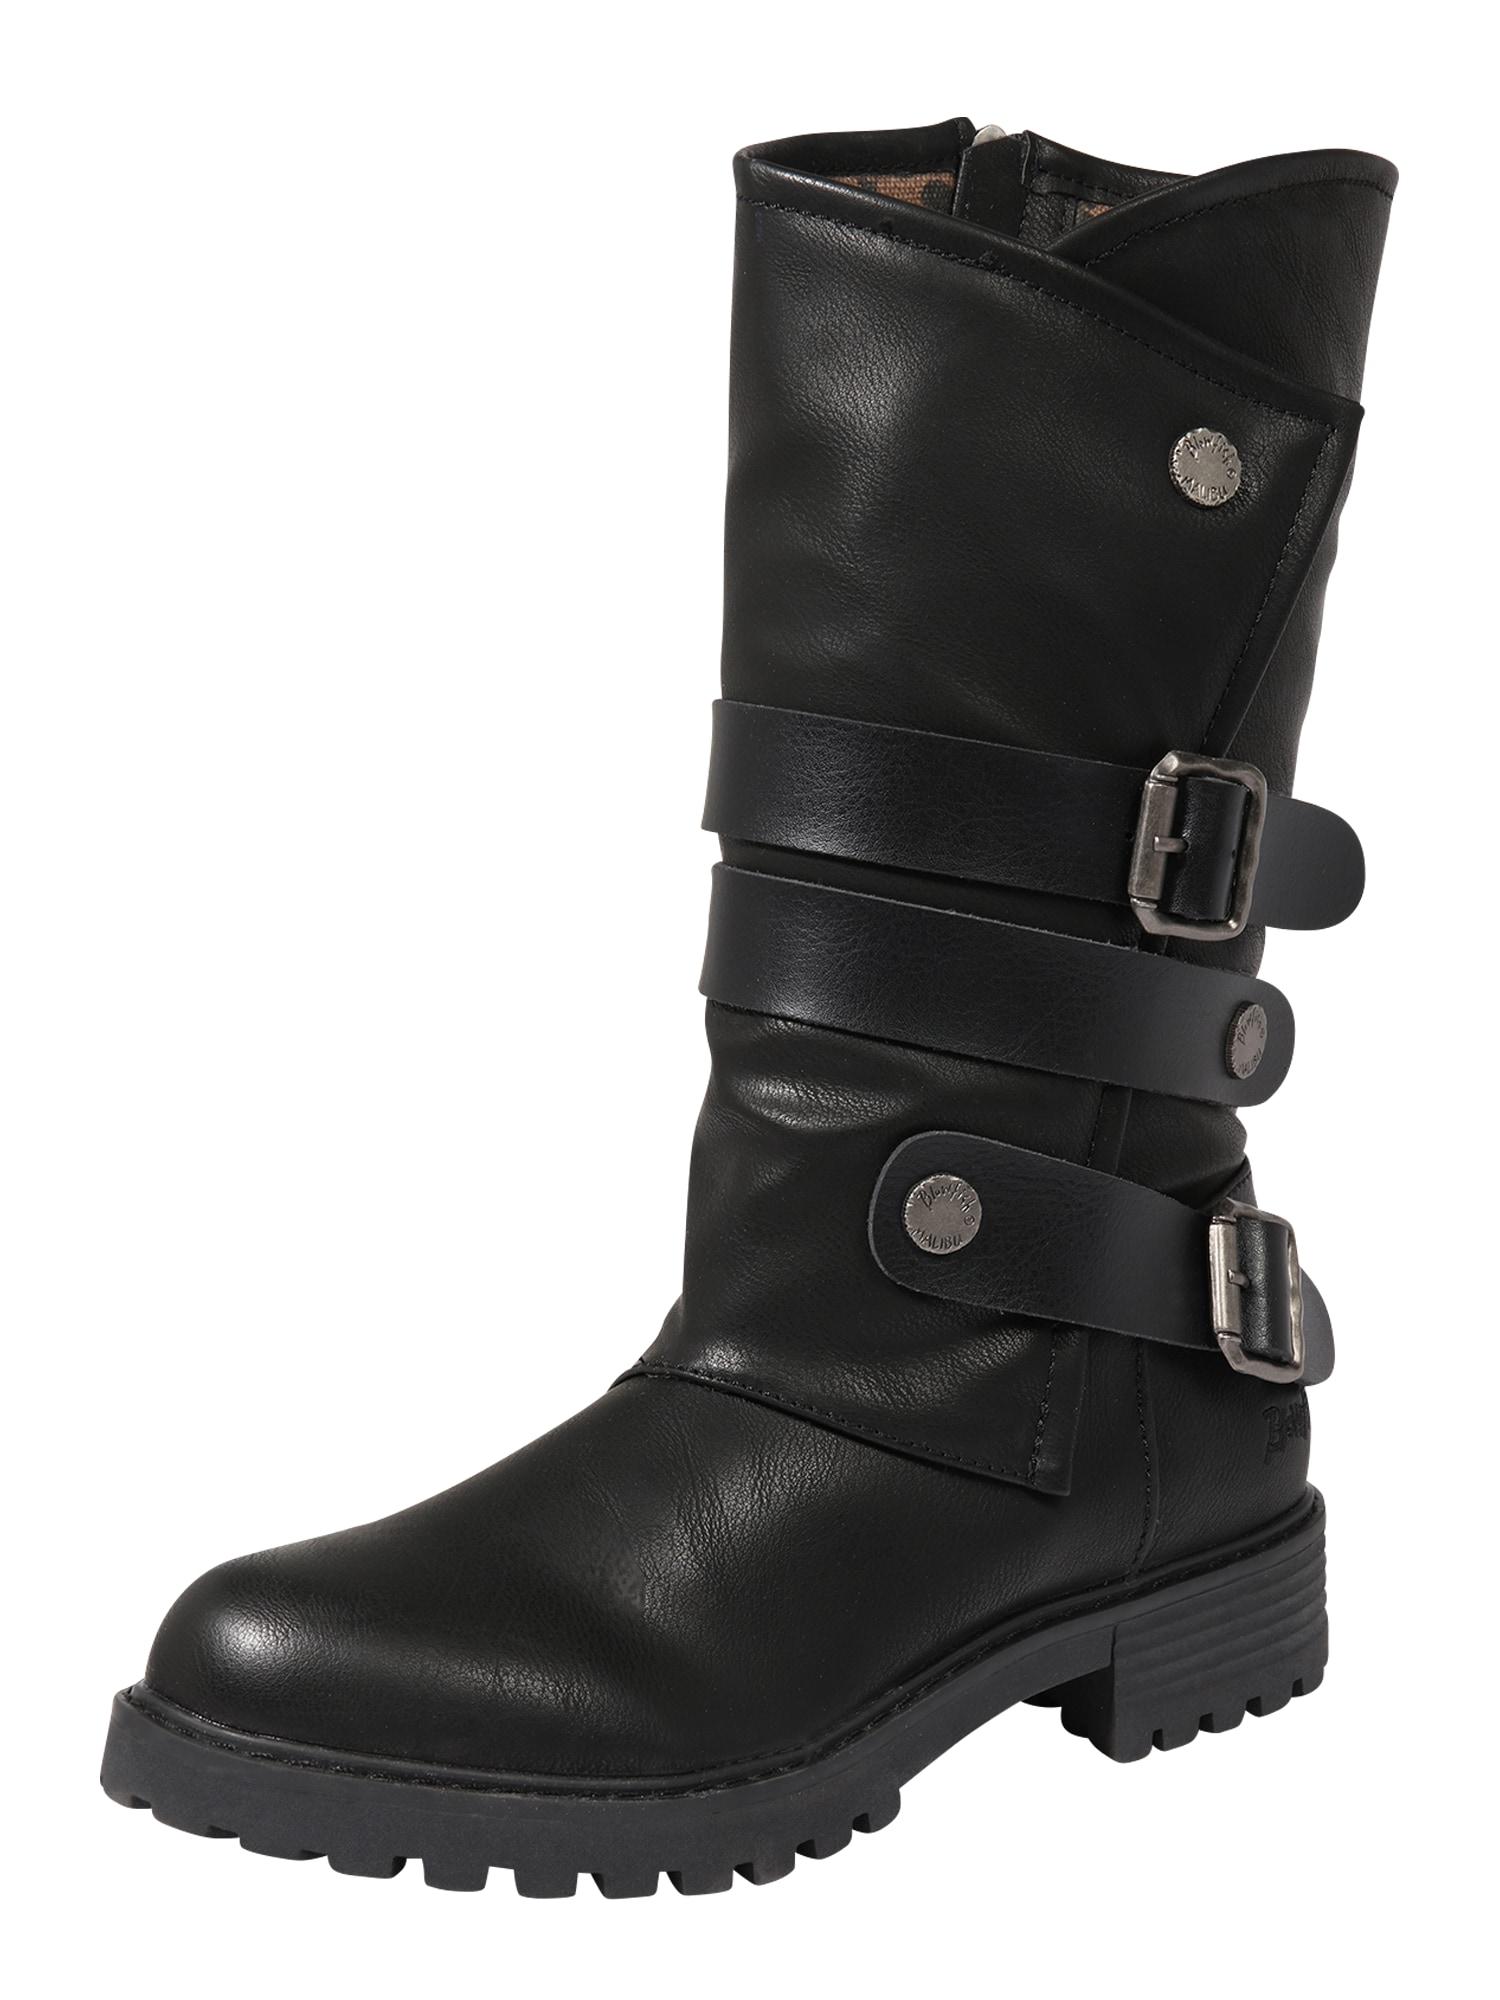 Blowfish Malibu Auliniai batai su kulniuku 'Raexy' juoda